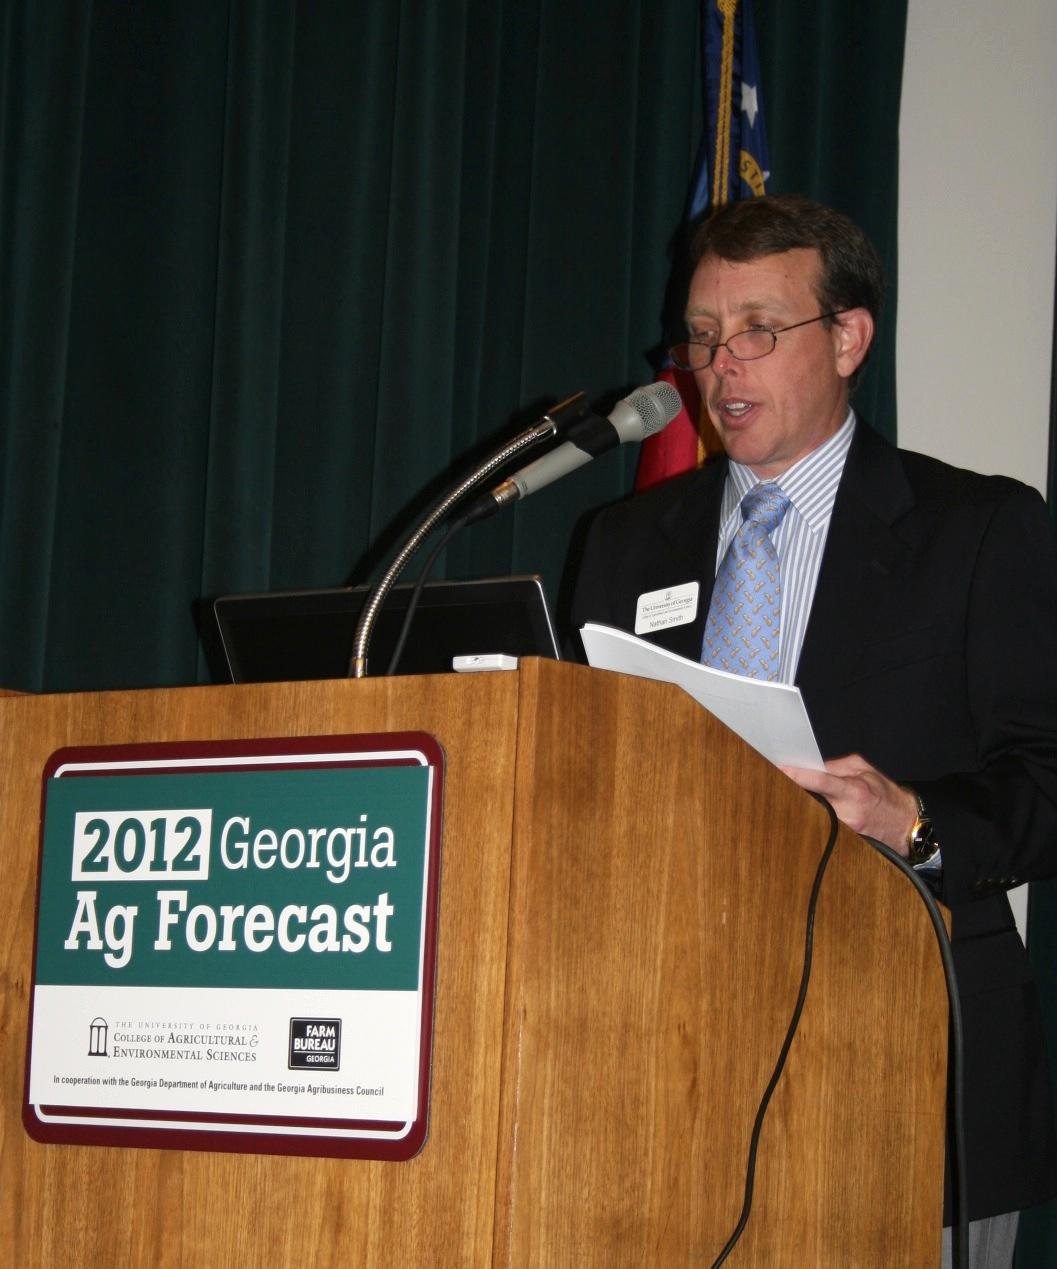 University of Georgia Extension economist Nathan Smith delivers the 2012 ag forecast to a group in Macon, Ga., at the Georgia Farm Bureau.